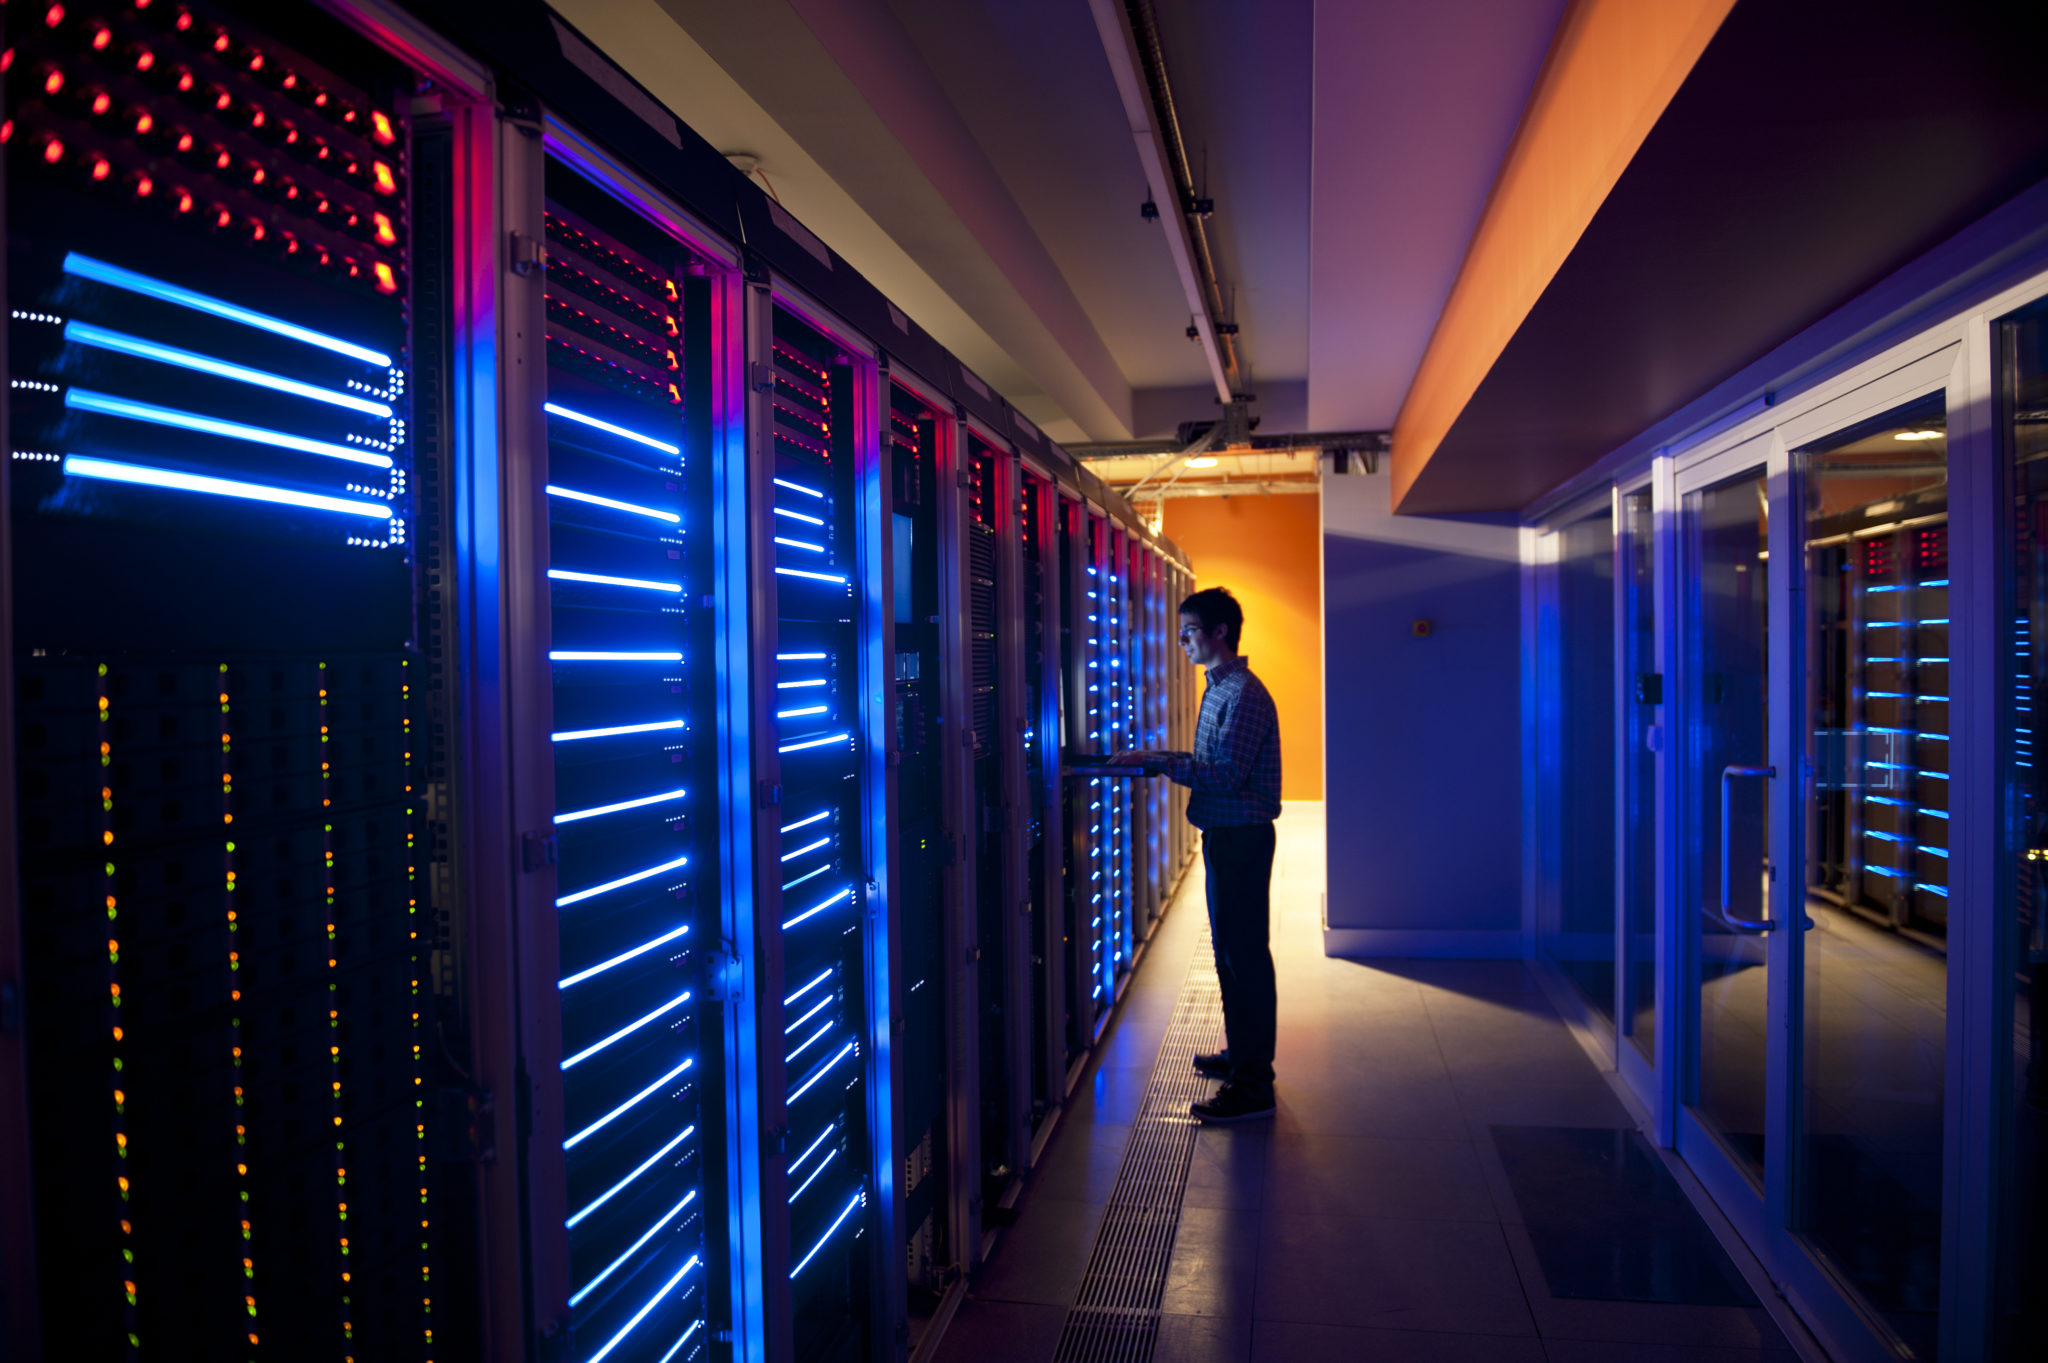 DB_network_server